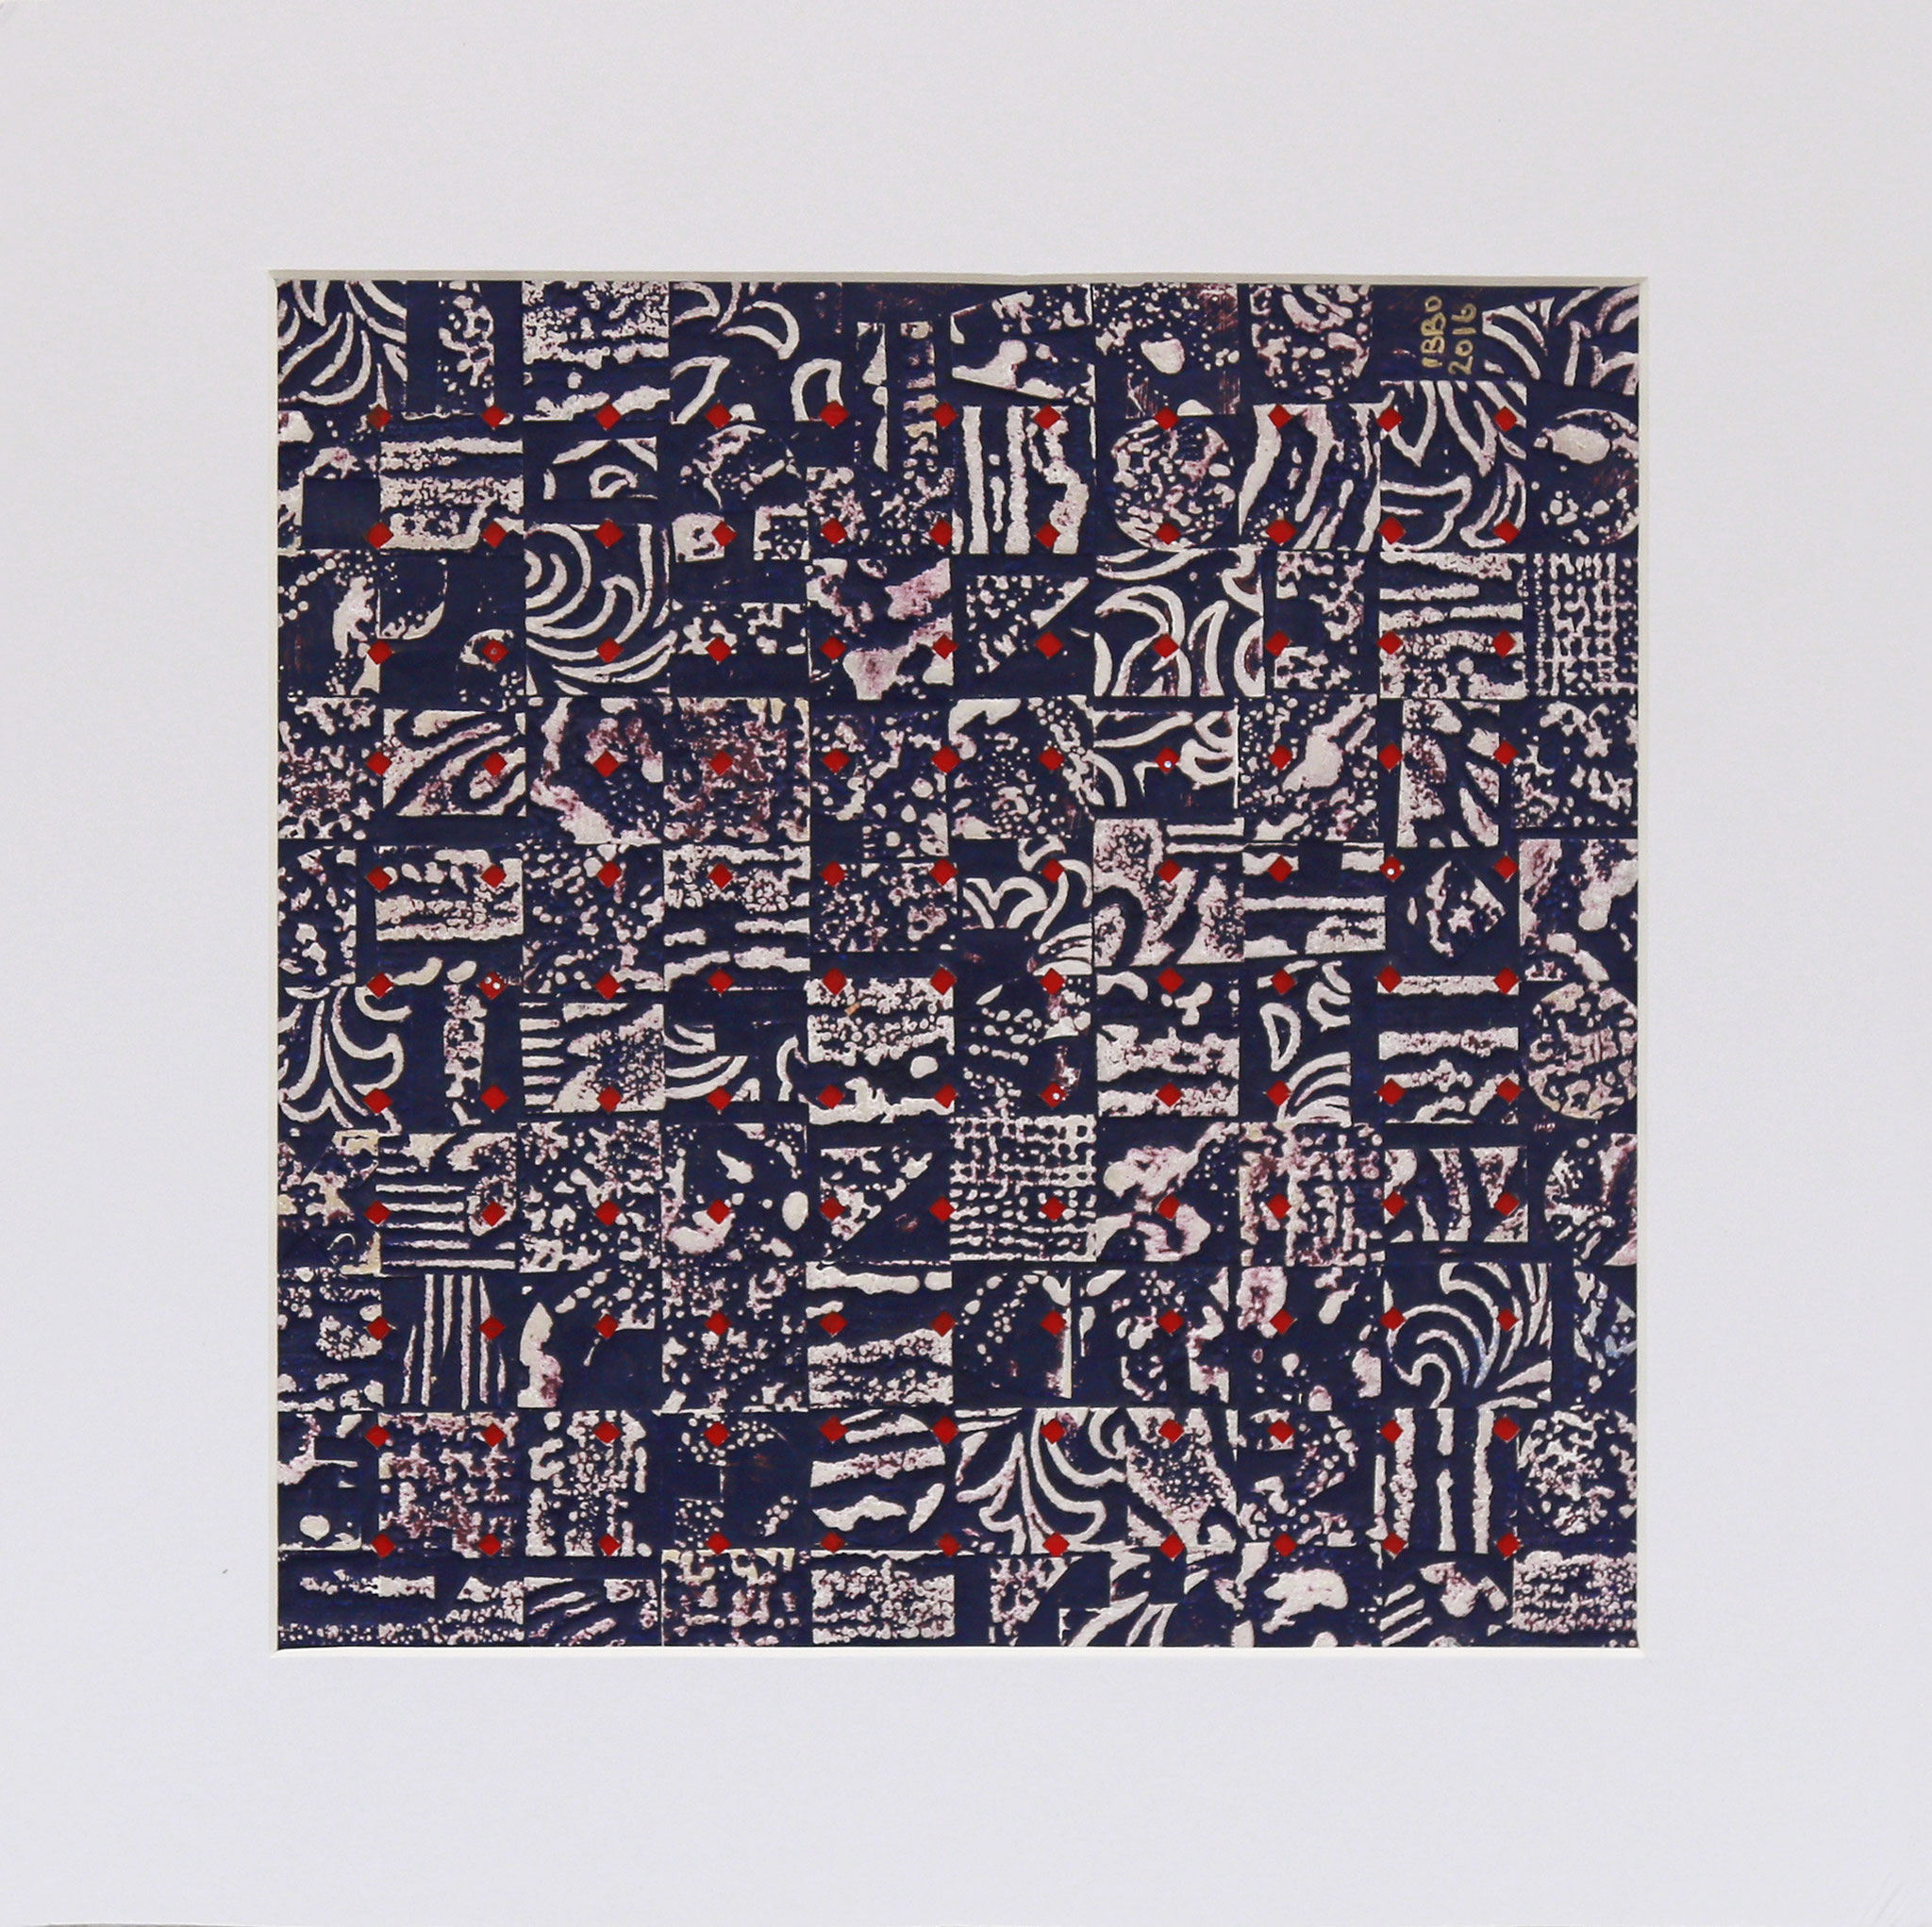 2010 Blue Relief 24 x 24 cm Mixed media (34 x 34 cm framed)